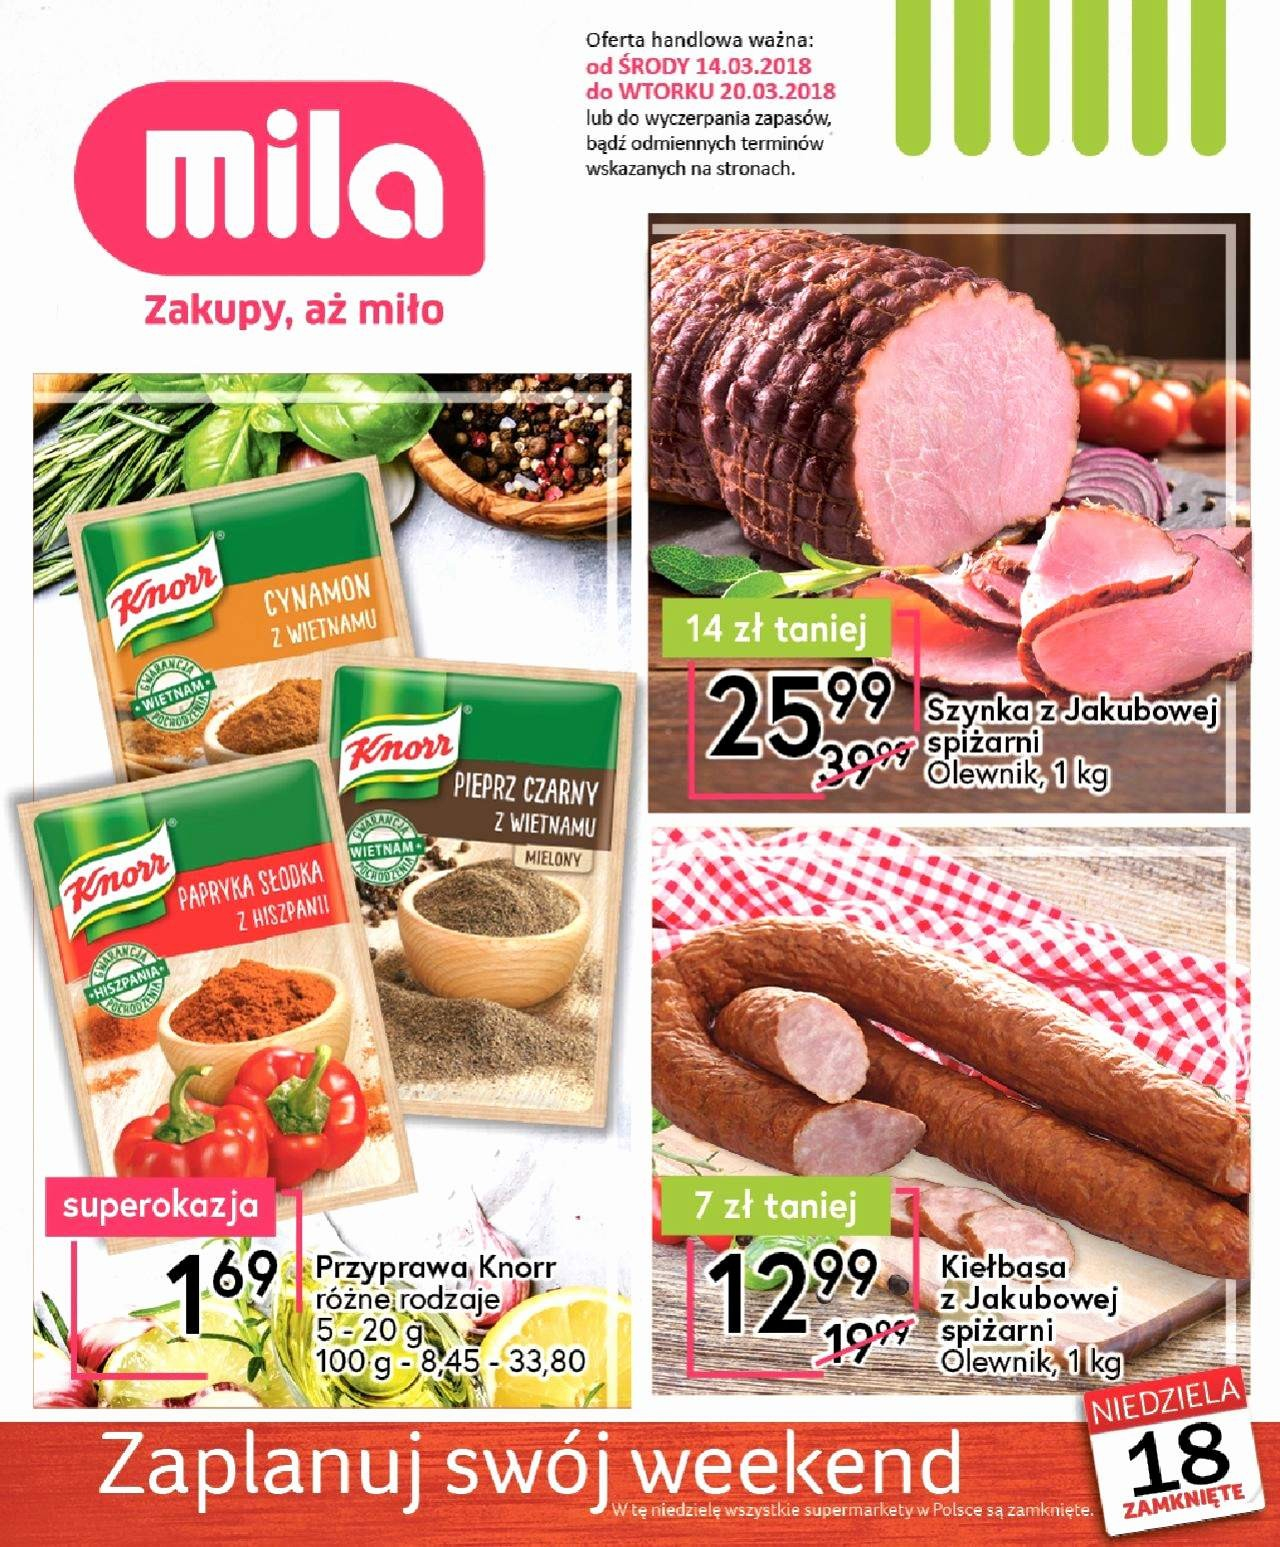 Jeux de fille cuisine de sara inspirant photos jeux de cuisine pour fille - Jeux de ecole de cuisine de sara ...